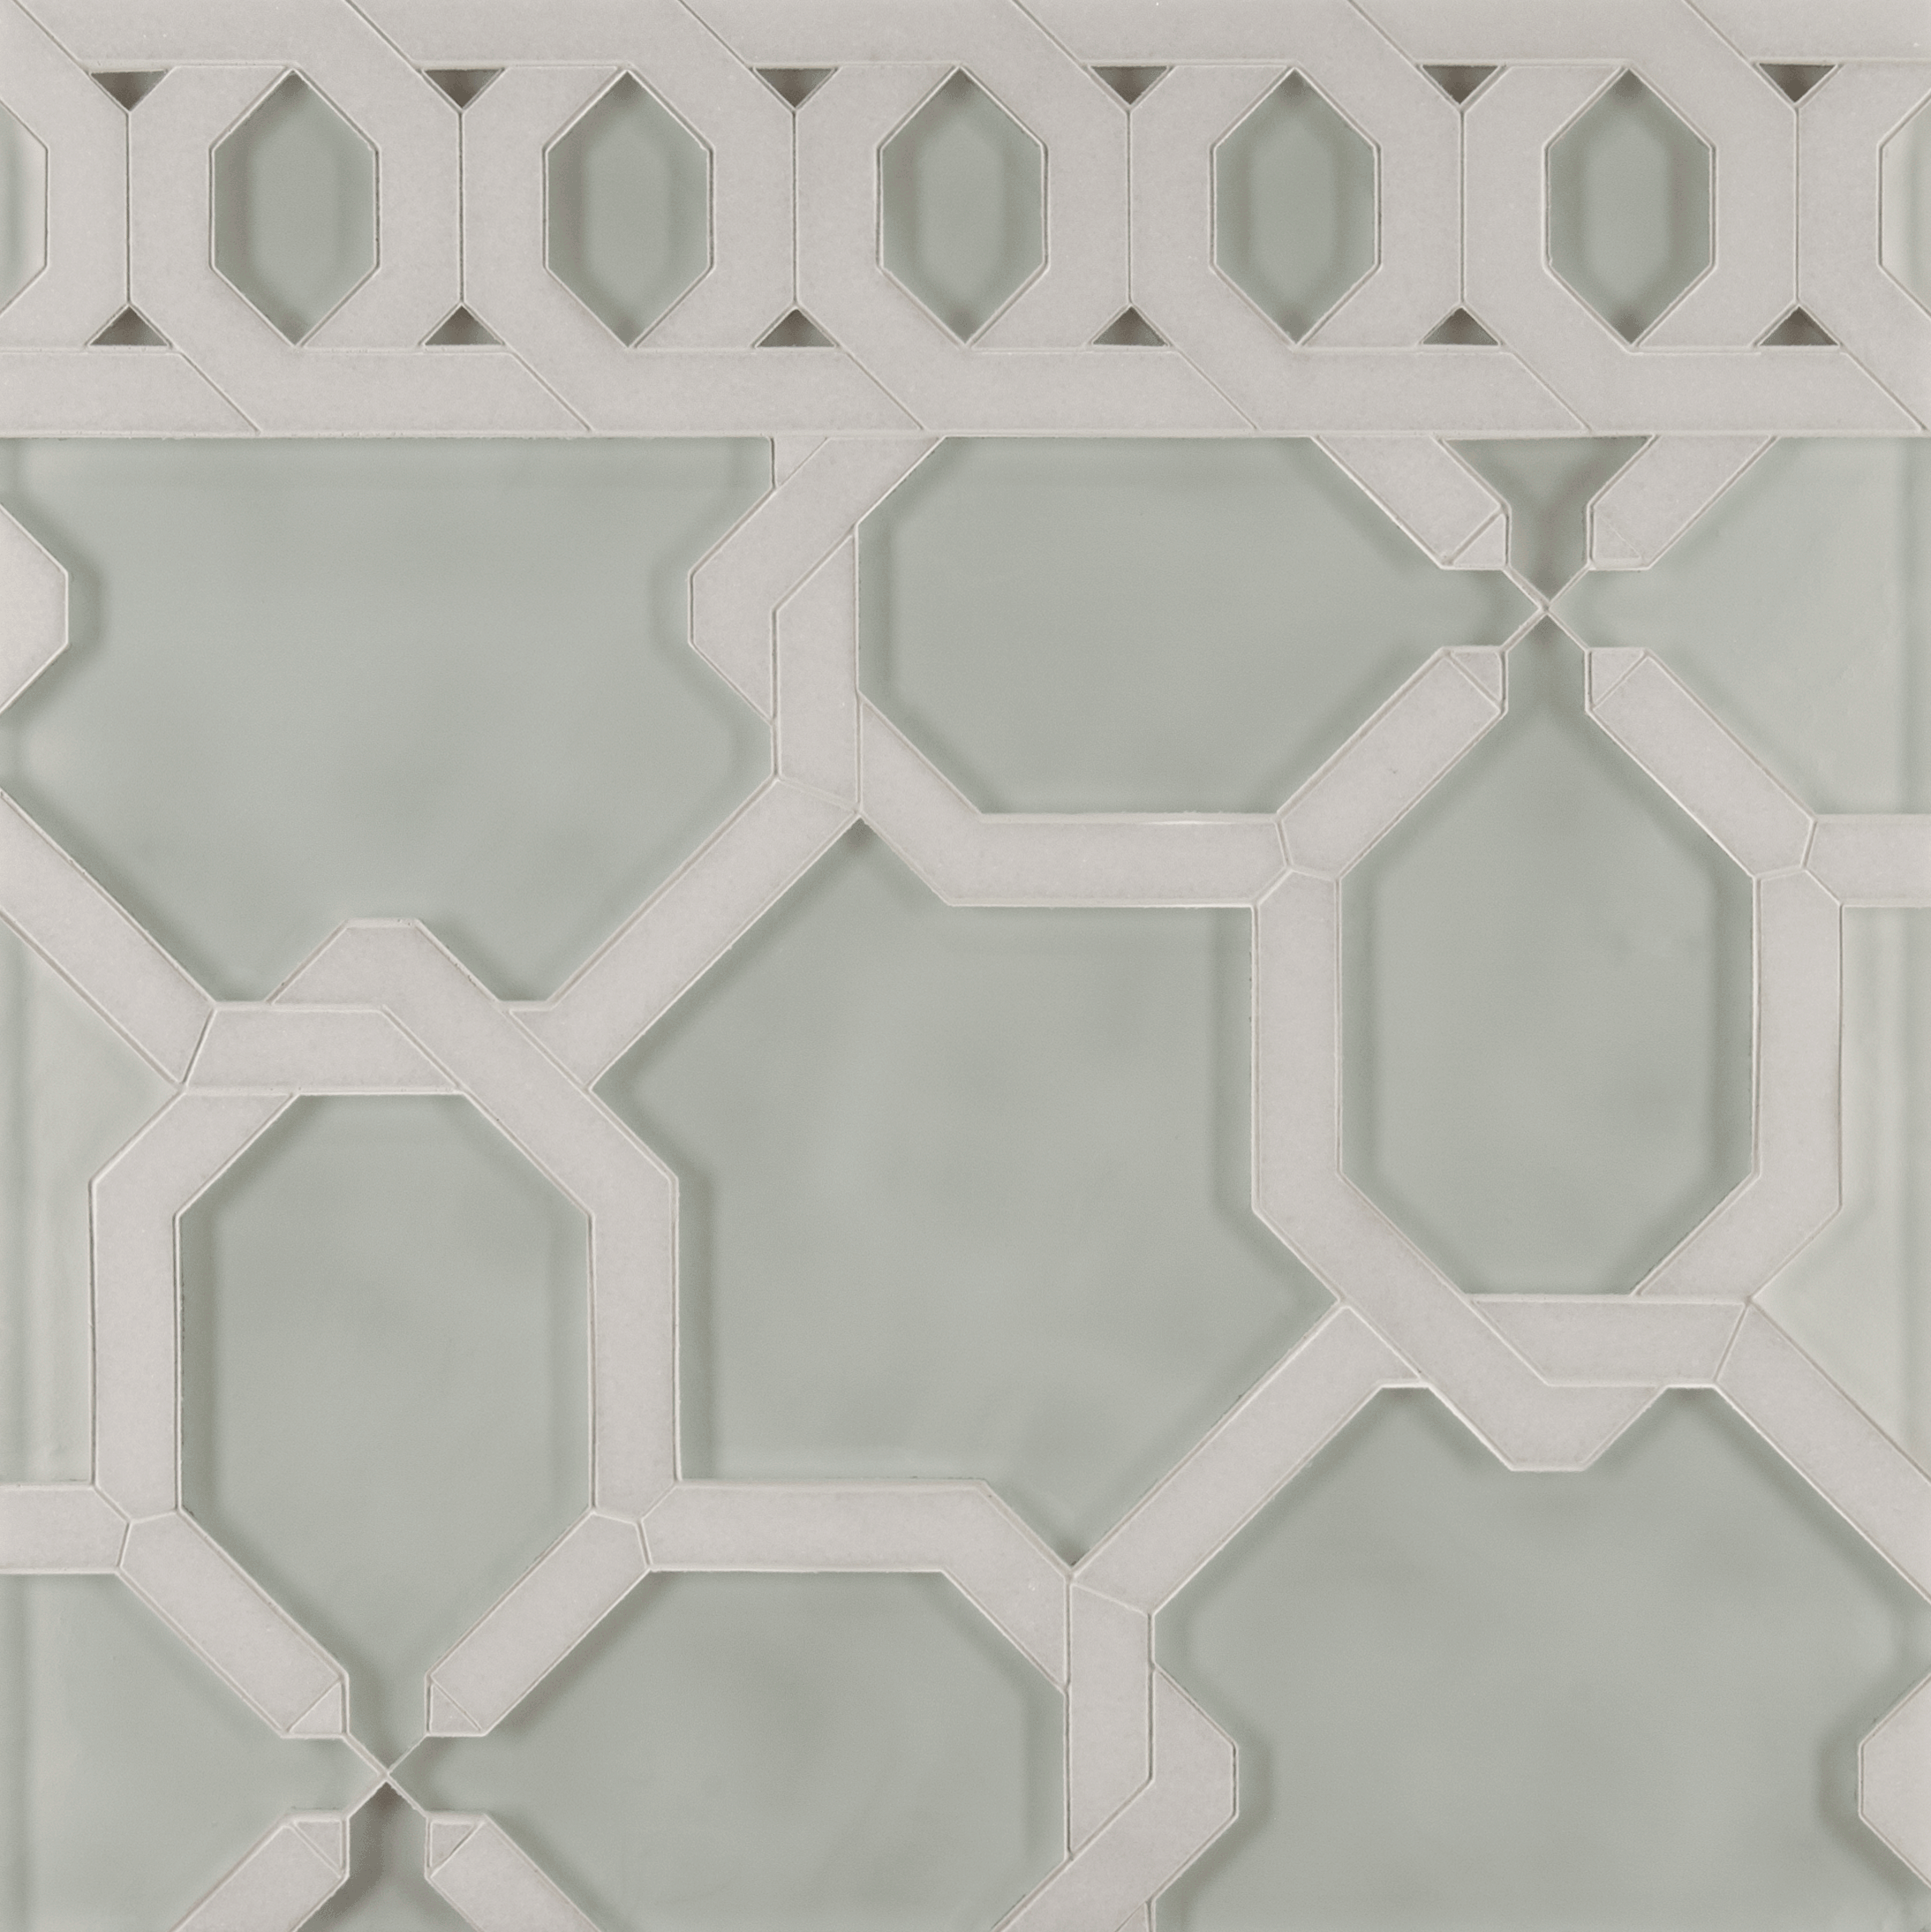 Ann Sacks Mosaic Bathroom Tile: ANN SACKS Liberty Renwick Petite Mosaic In Diamond White